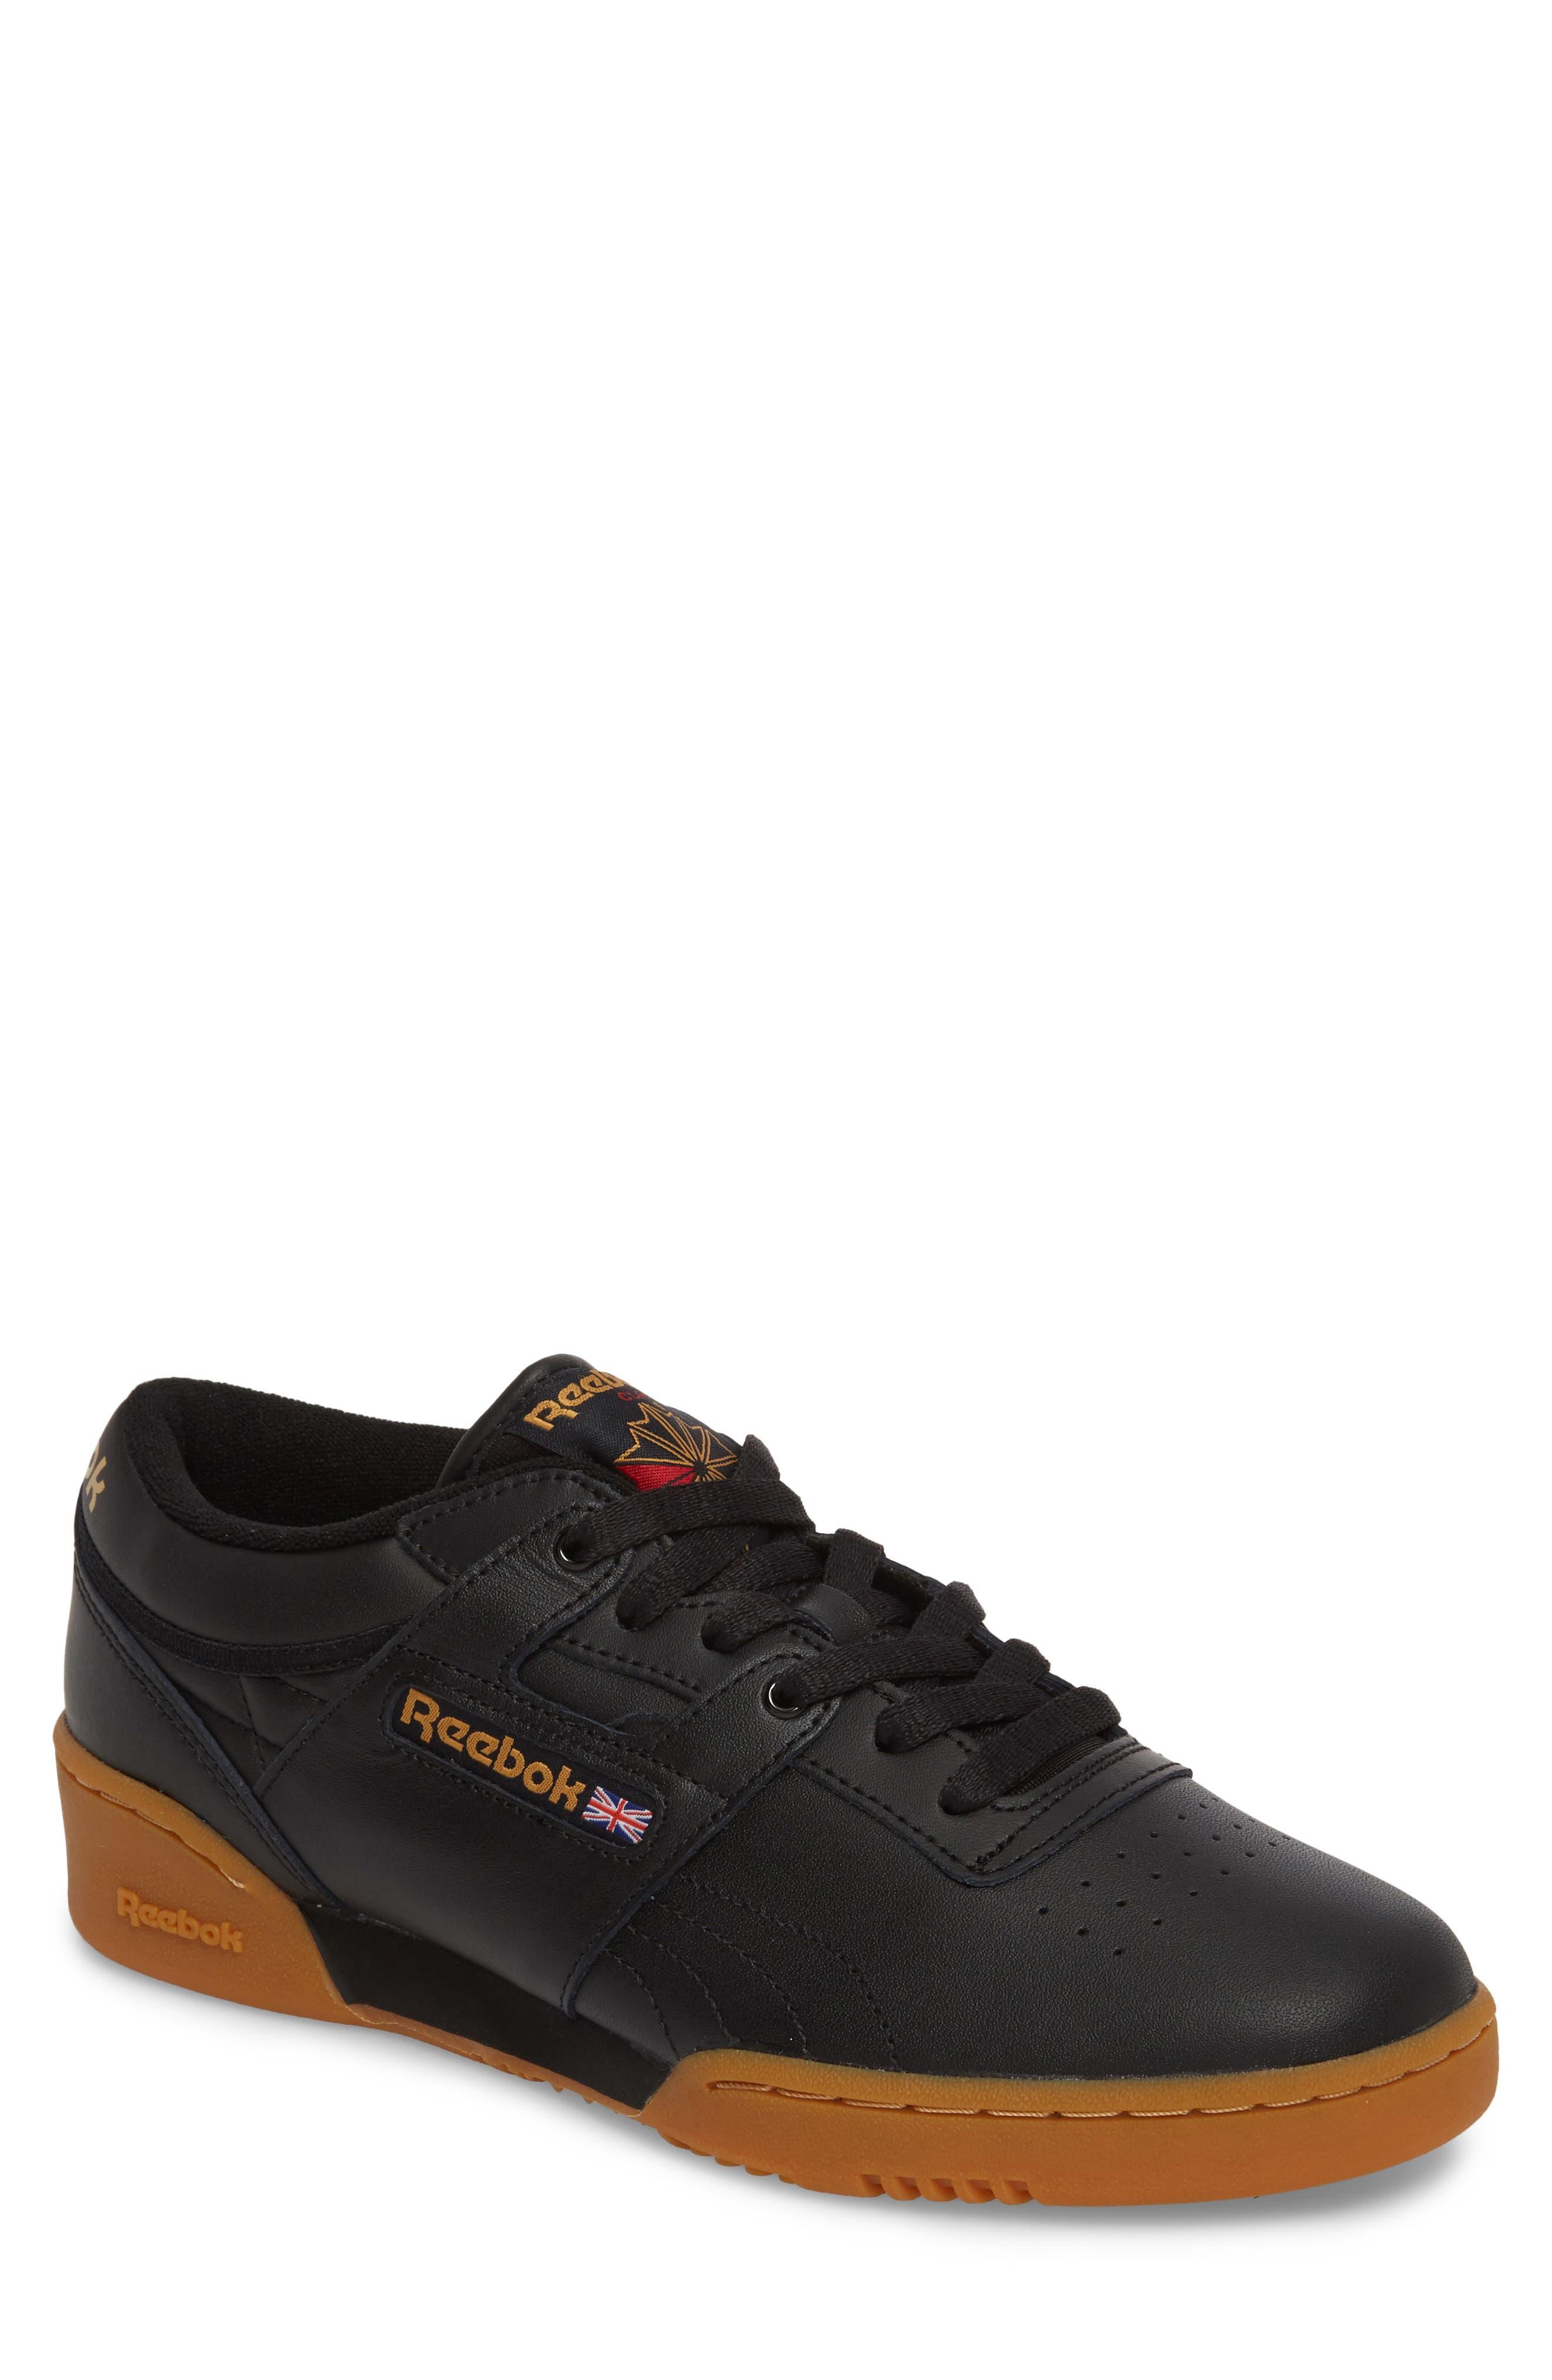 Reebok Workout Low Top Sneaker (Men)